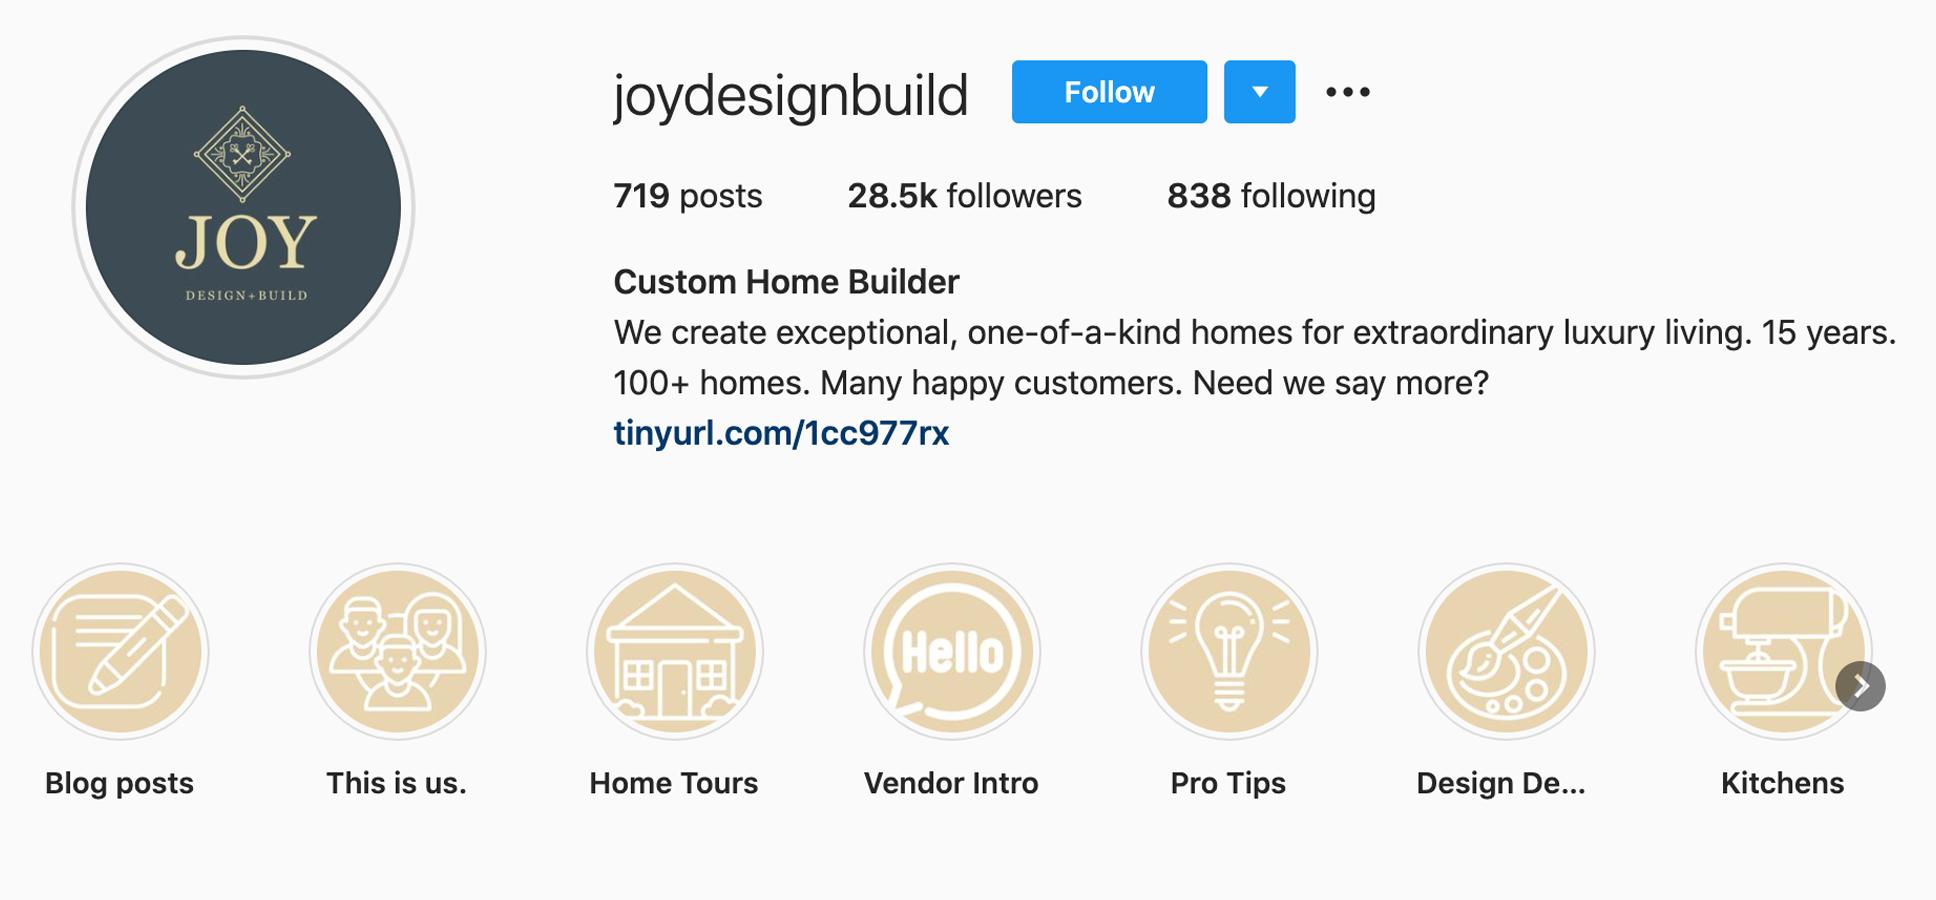 custom-home-builder-joydesignbuild-instagram-profile